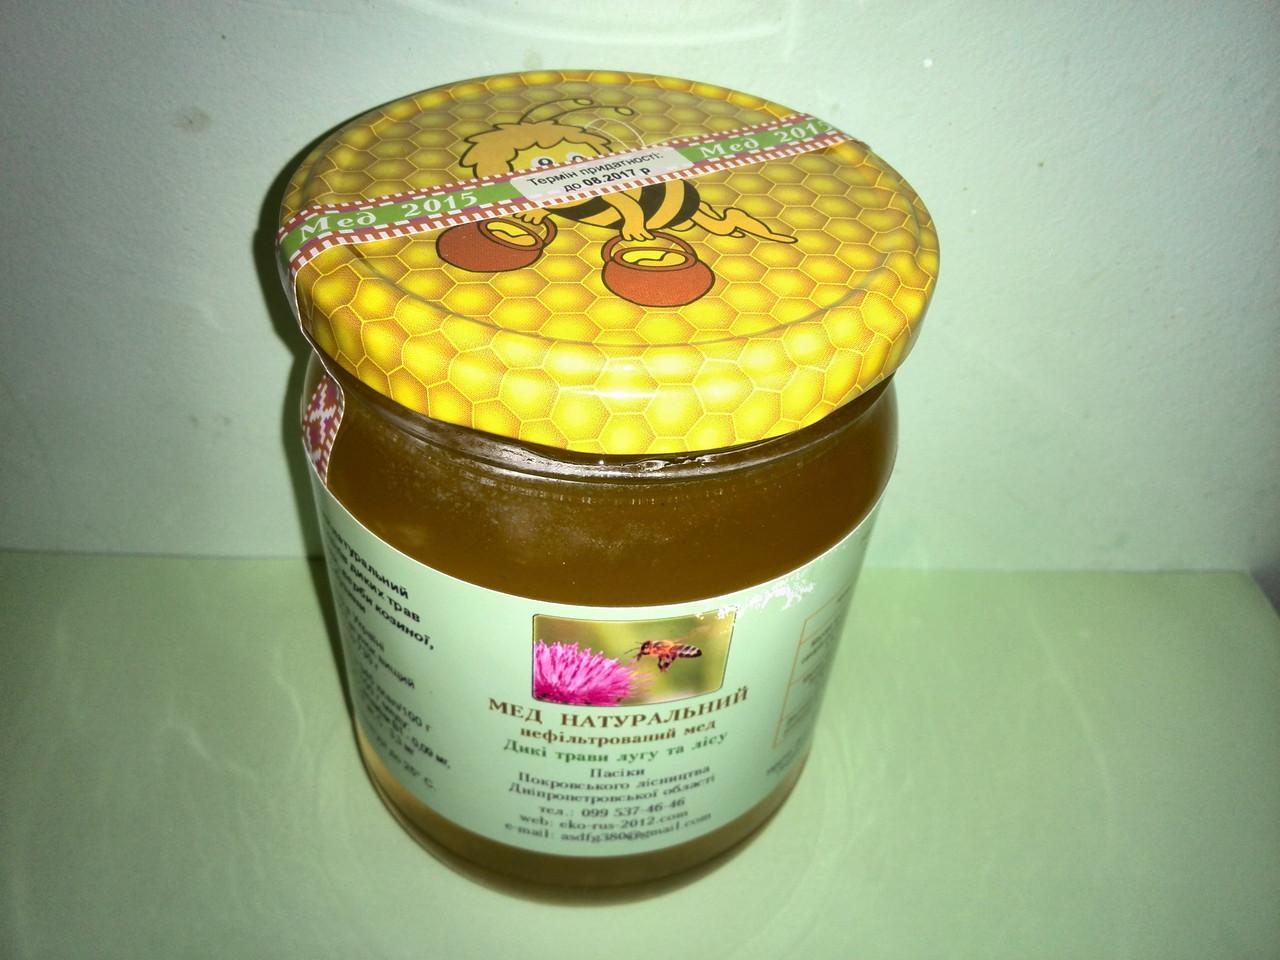 Мед натуральный, 730 г.